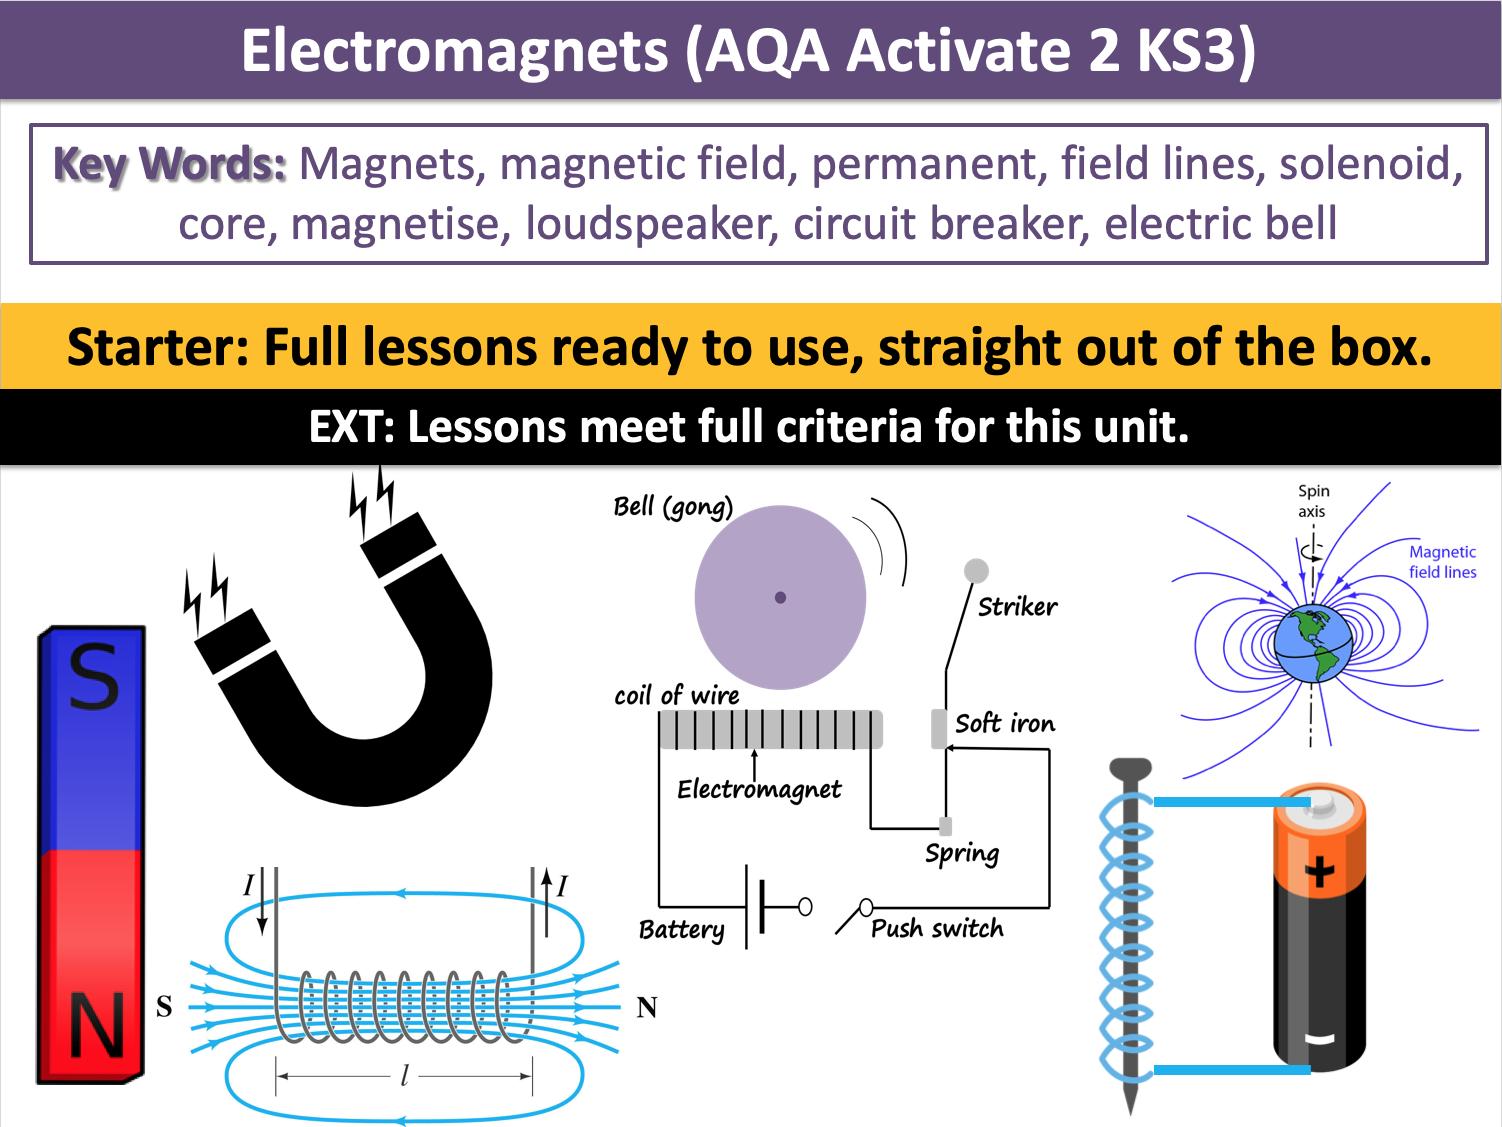 Electromagnets (AQA Activate 2 KS3)